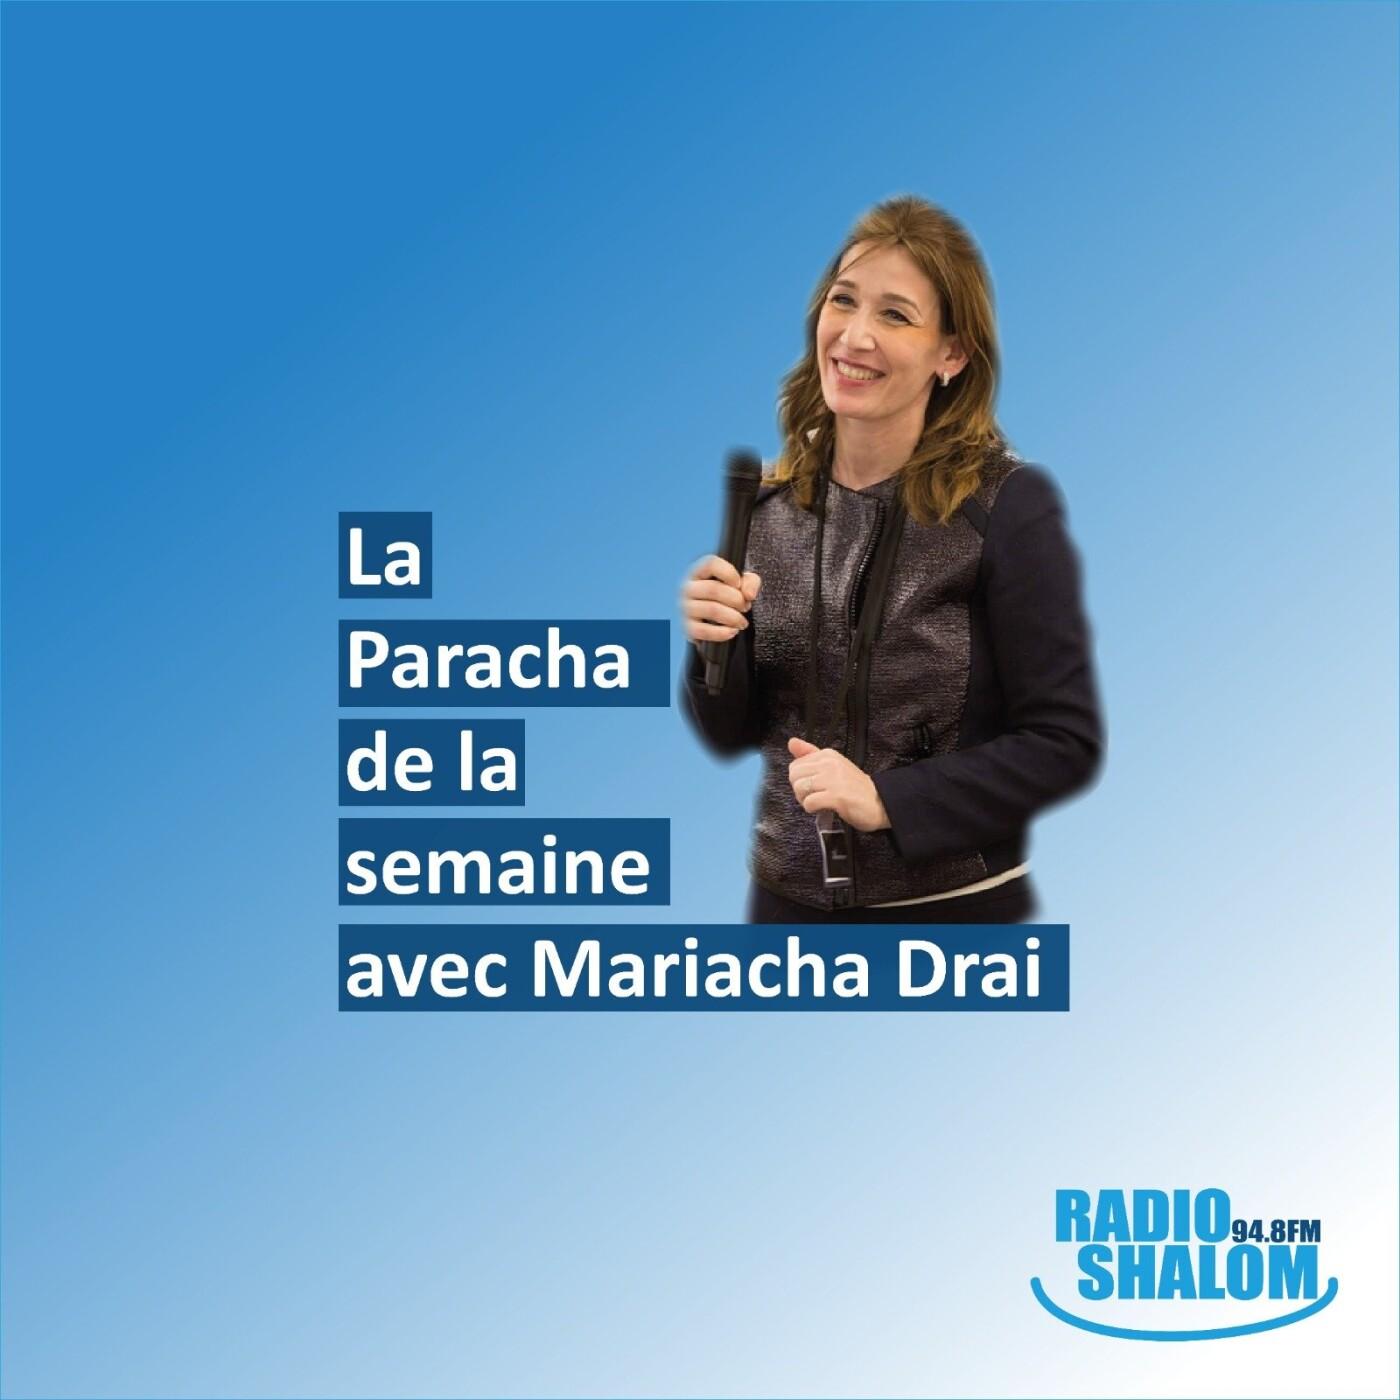 La paracha de le semaine, avec Mariacha Drai